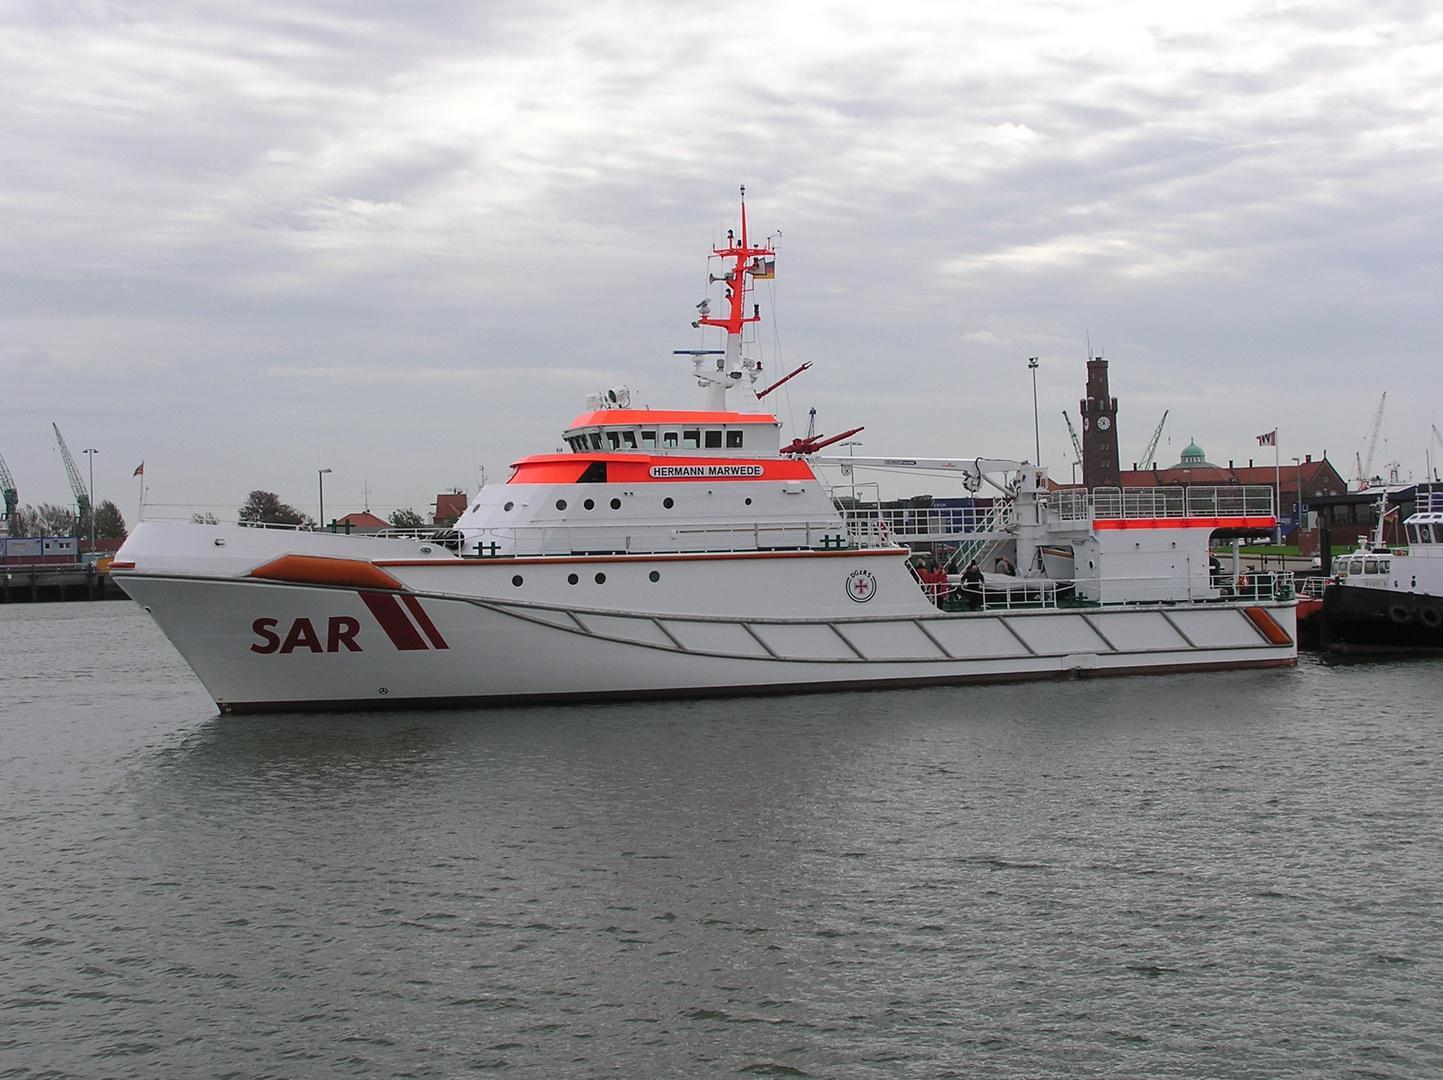 Seenotrettungskreuzer Herman Marwede